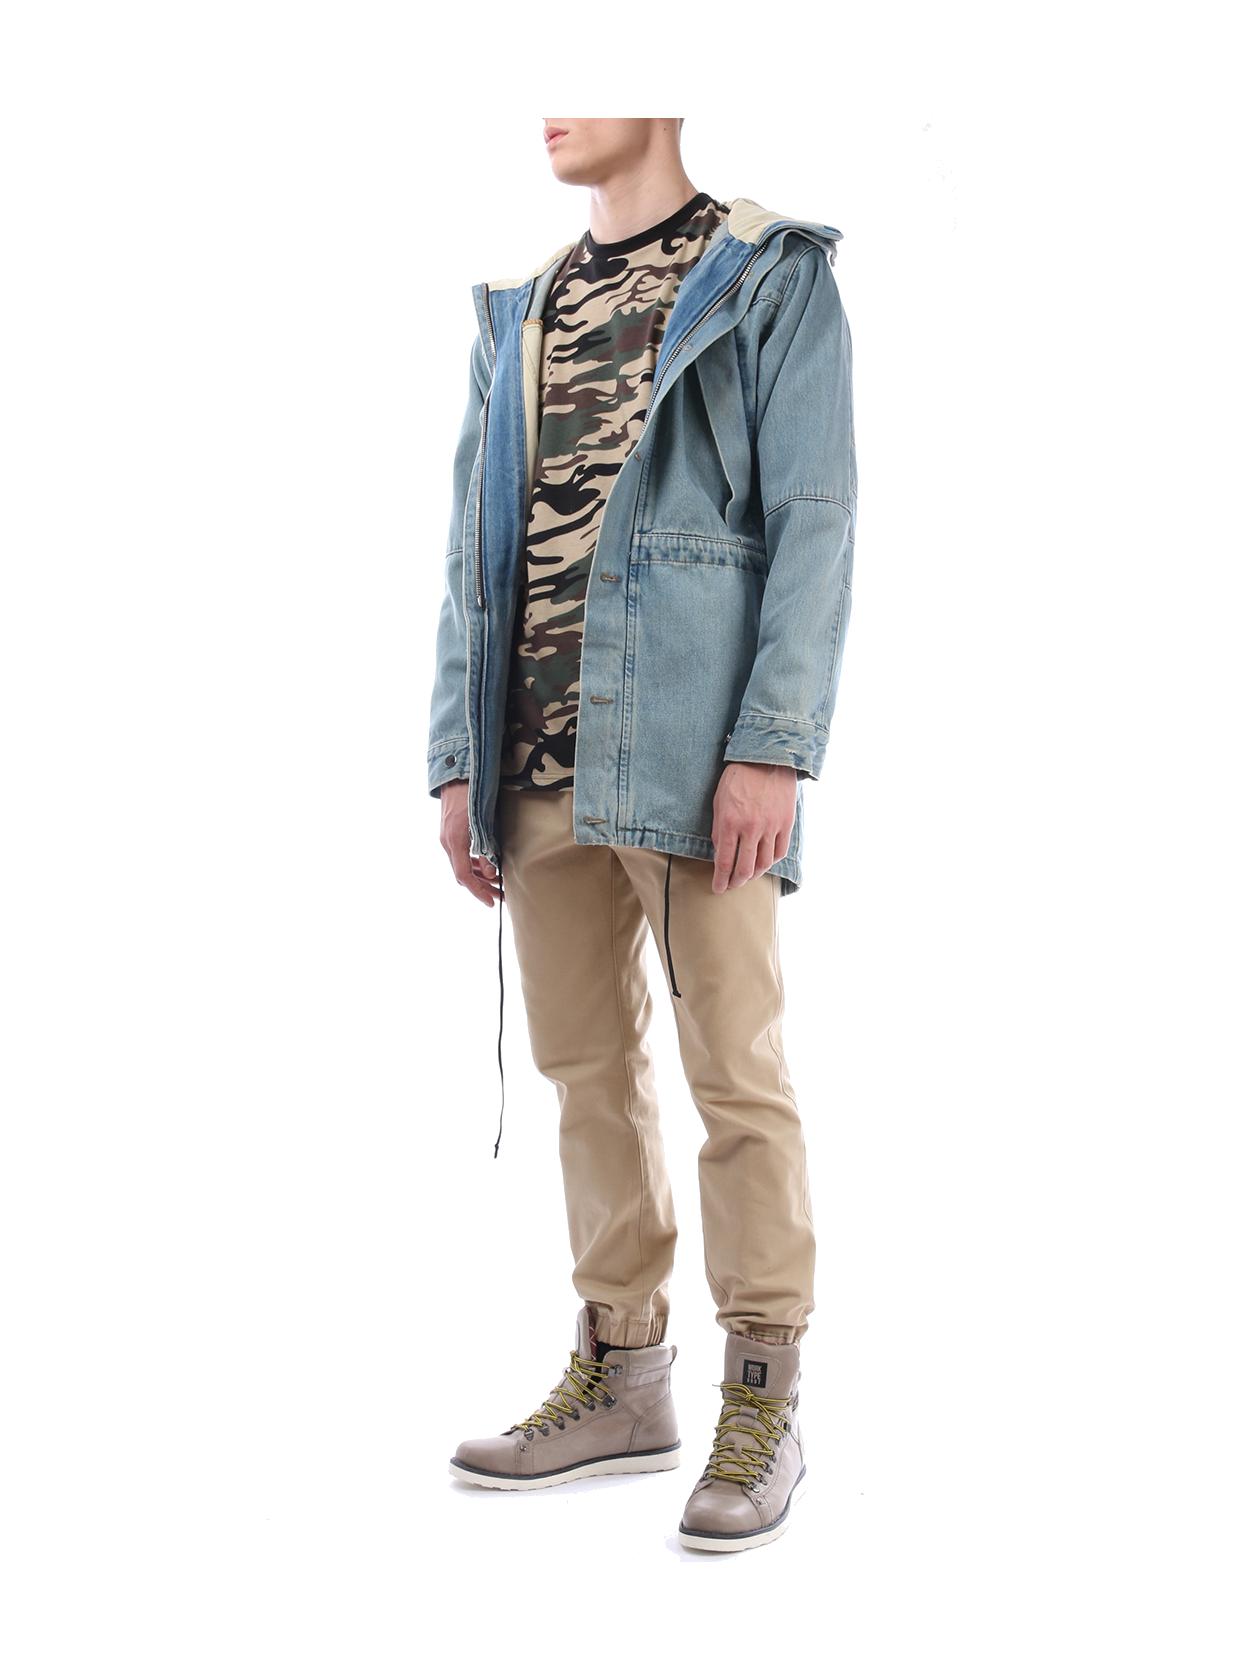 Unisex jeans jacket 13 от BlackStarWear INT